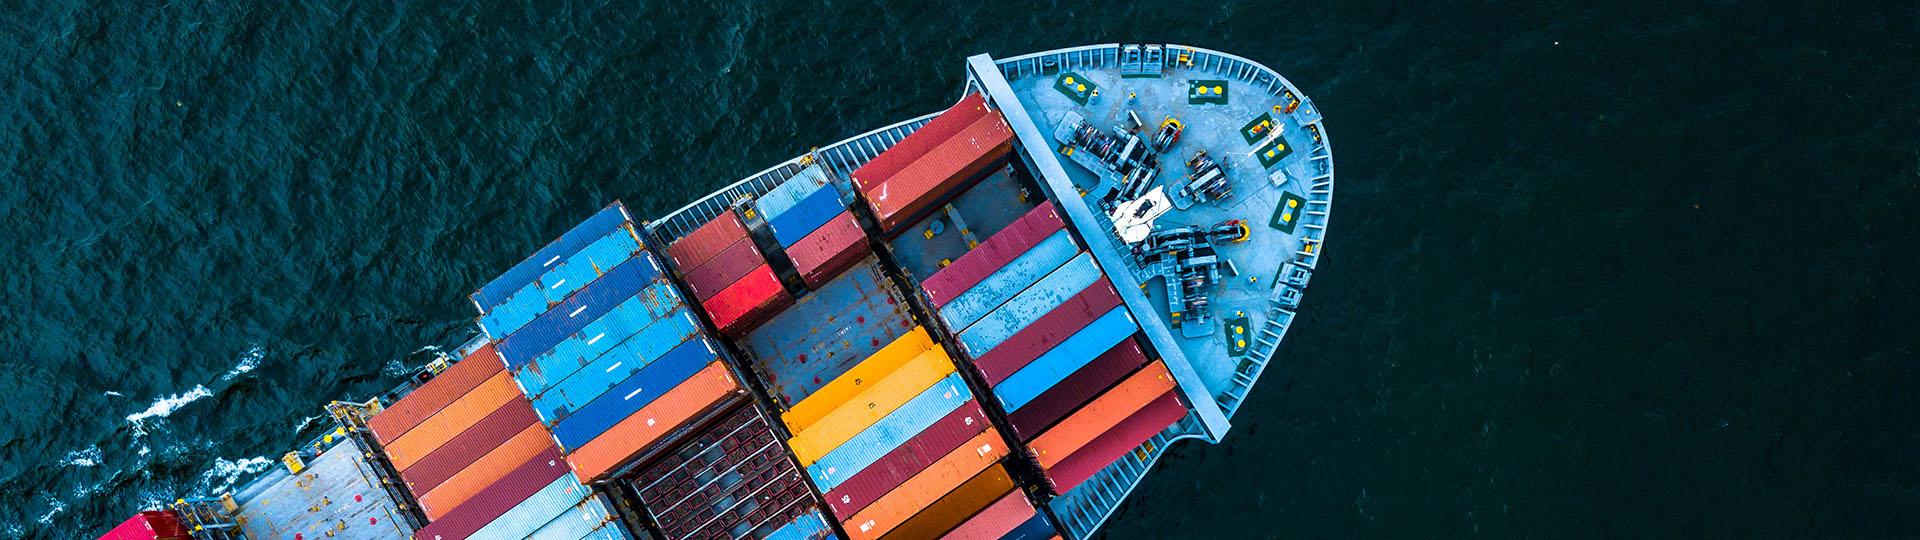 B2B E Business Modul Shipment